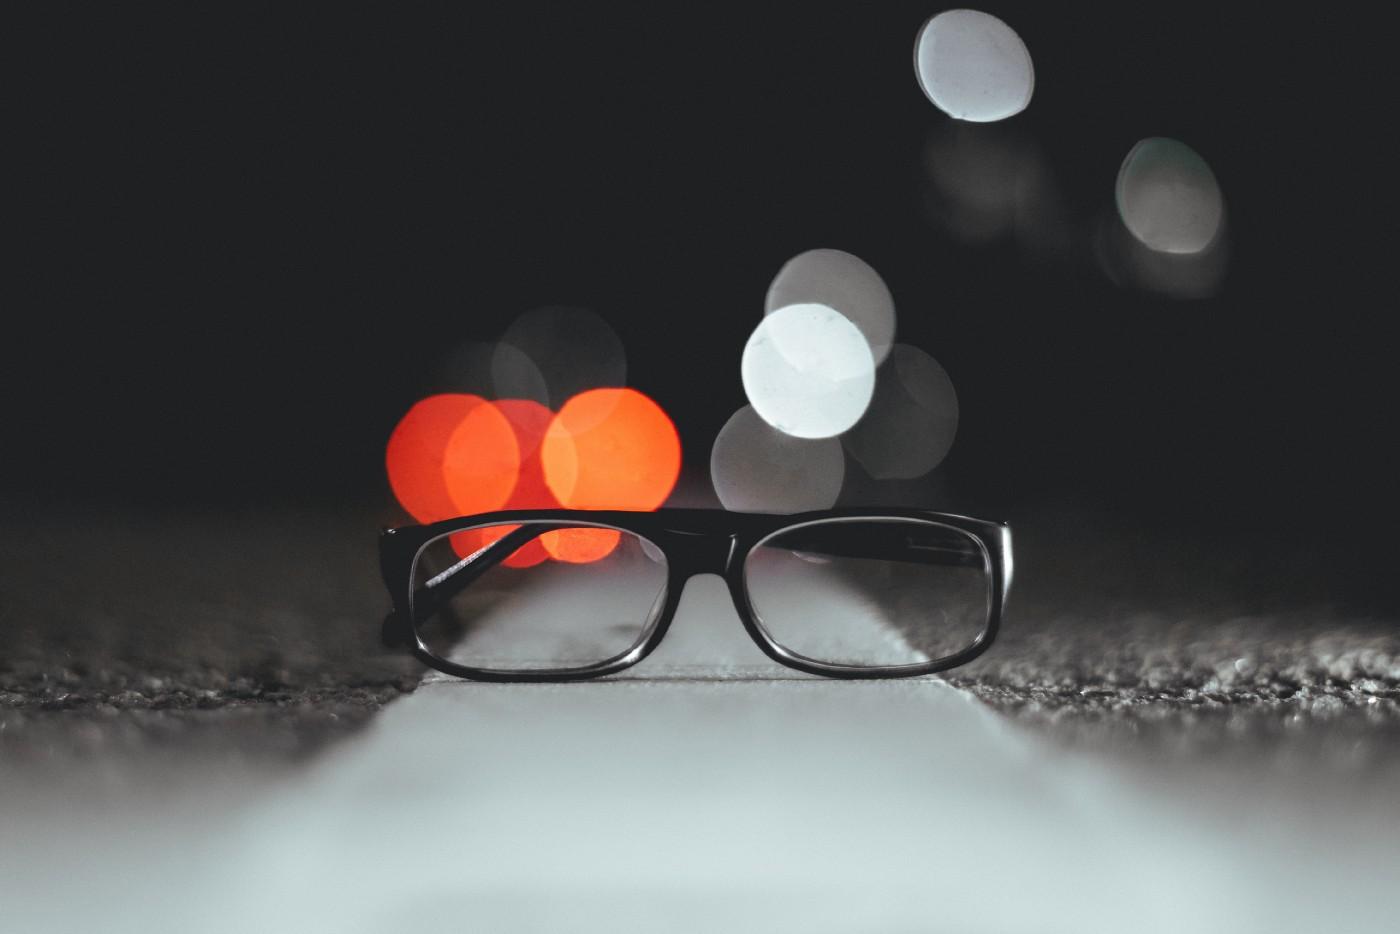 Glasses on road